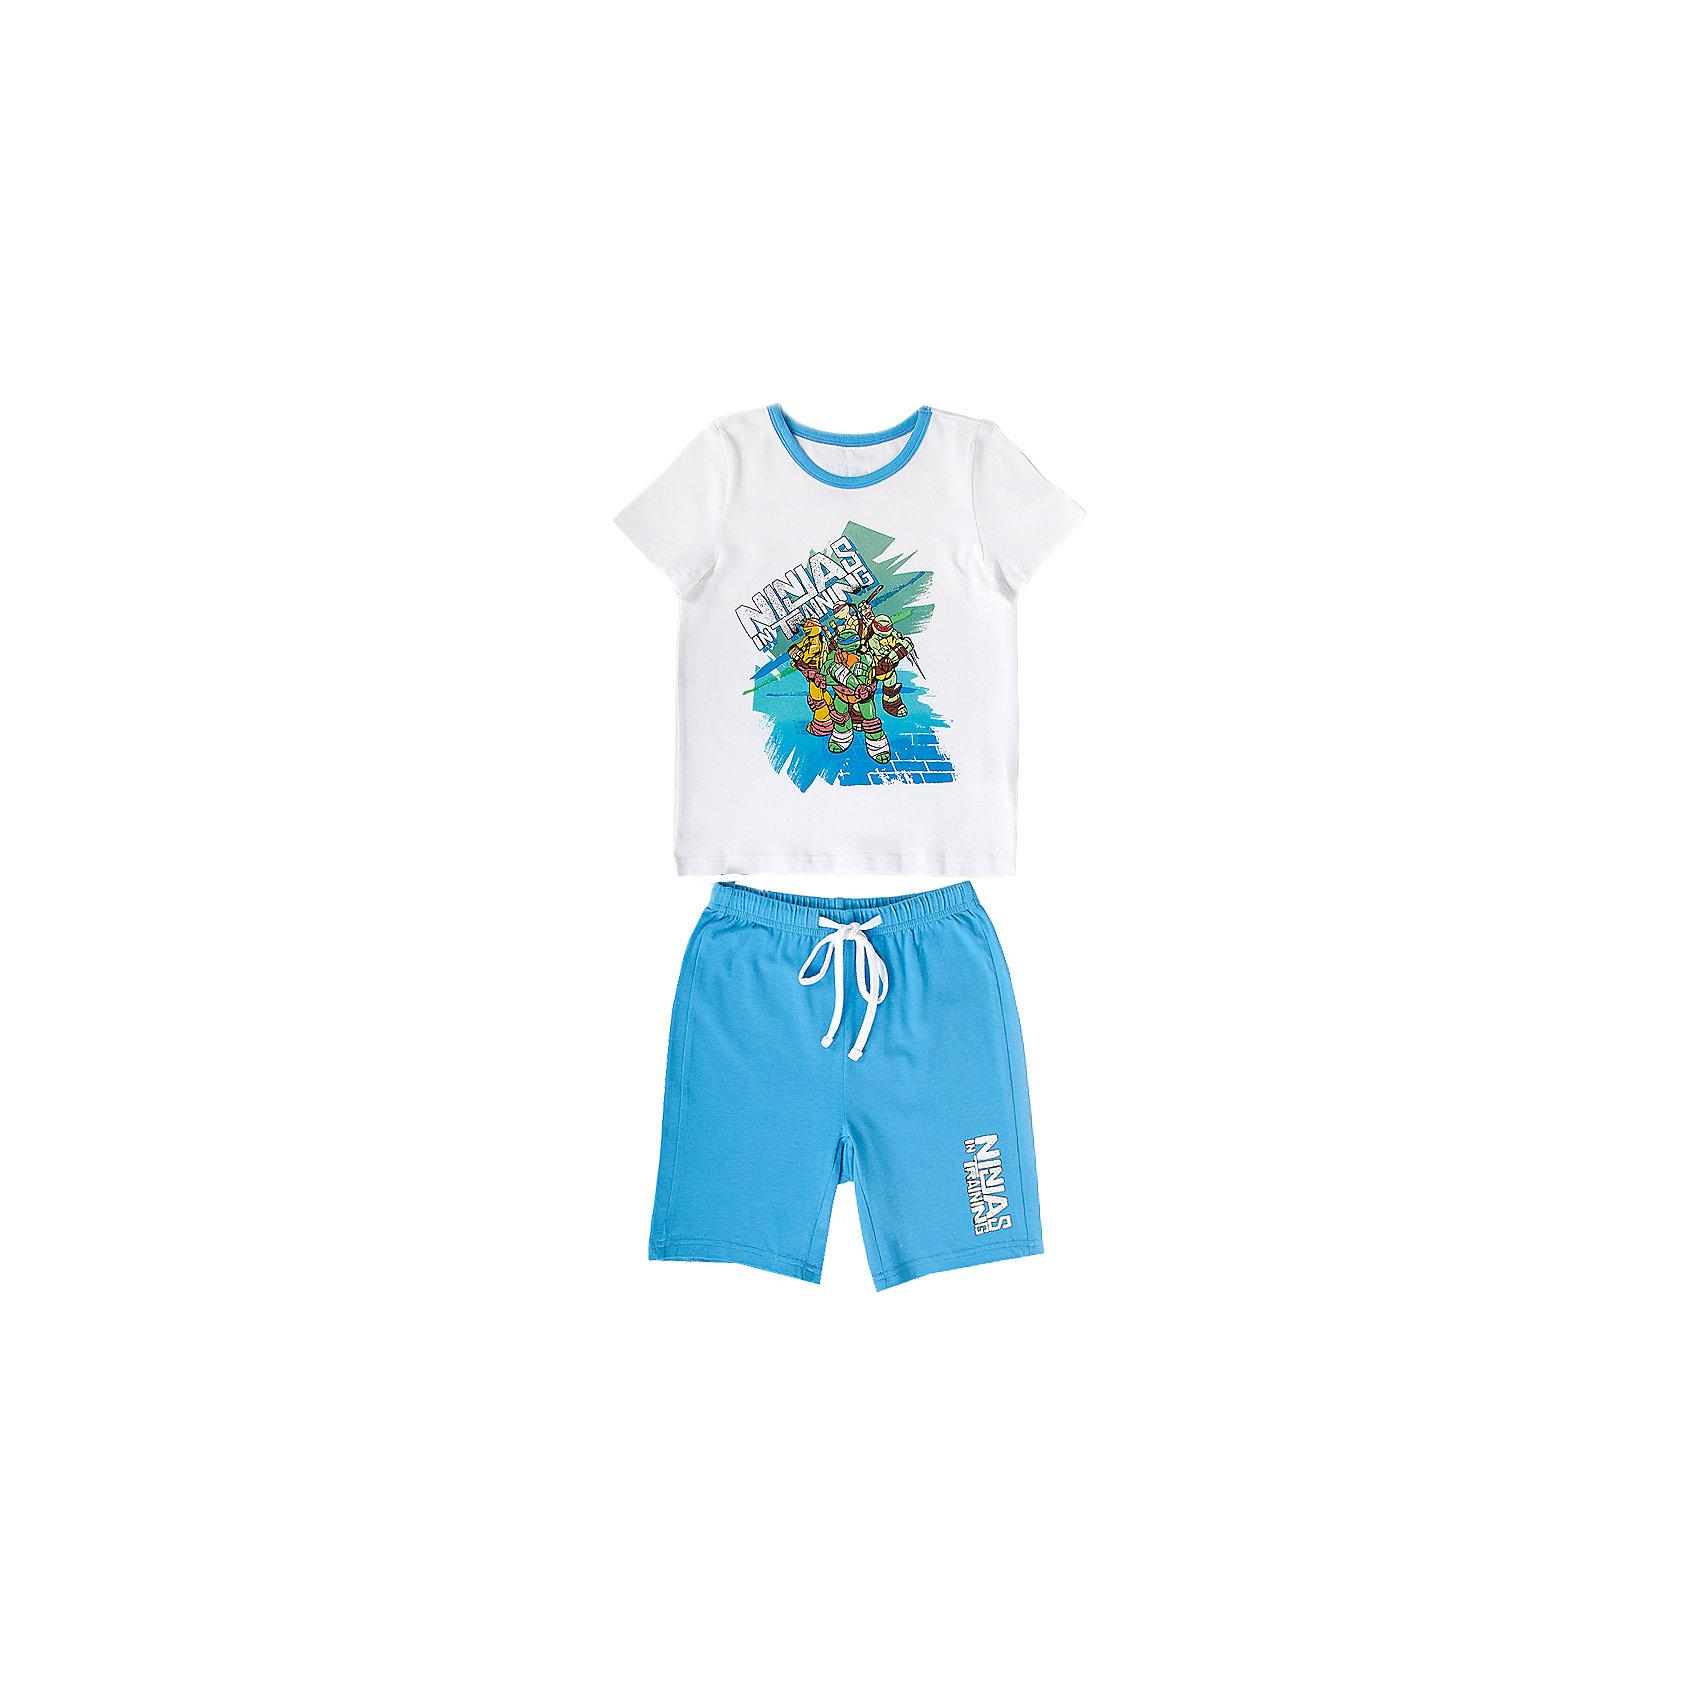 Button Blue Пижама для мальчика Черепашки ниндзя шапка для мальчика button blue цвет синий 217bbbx73054000 размер 52